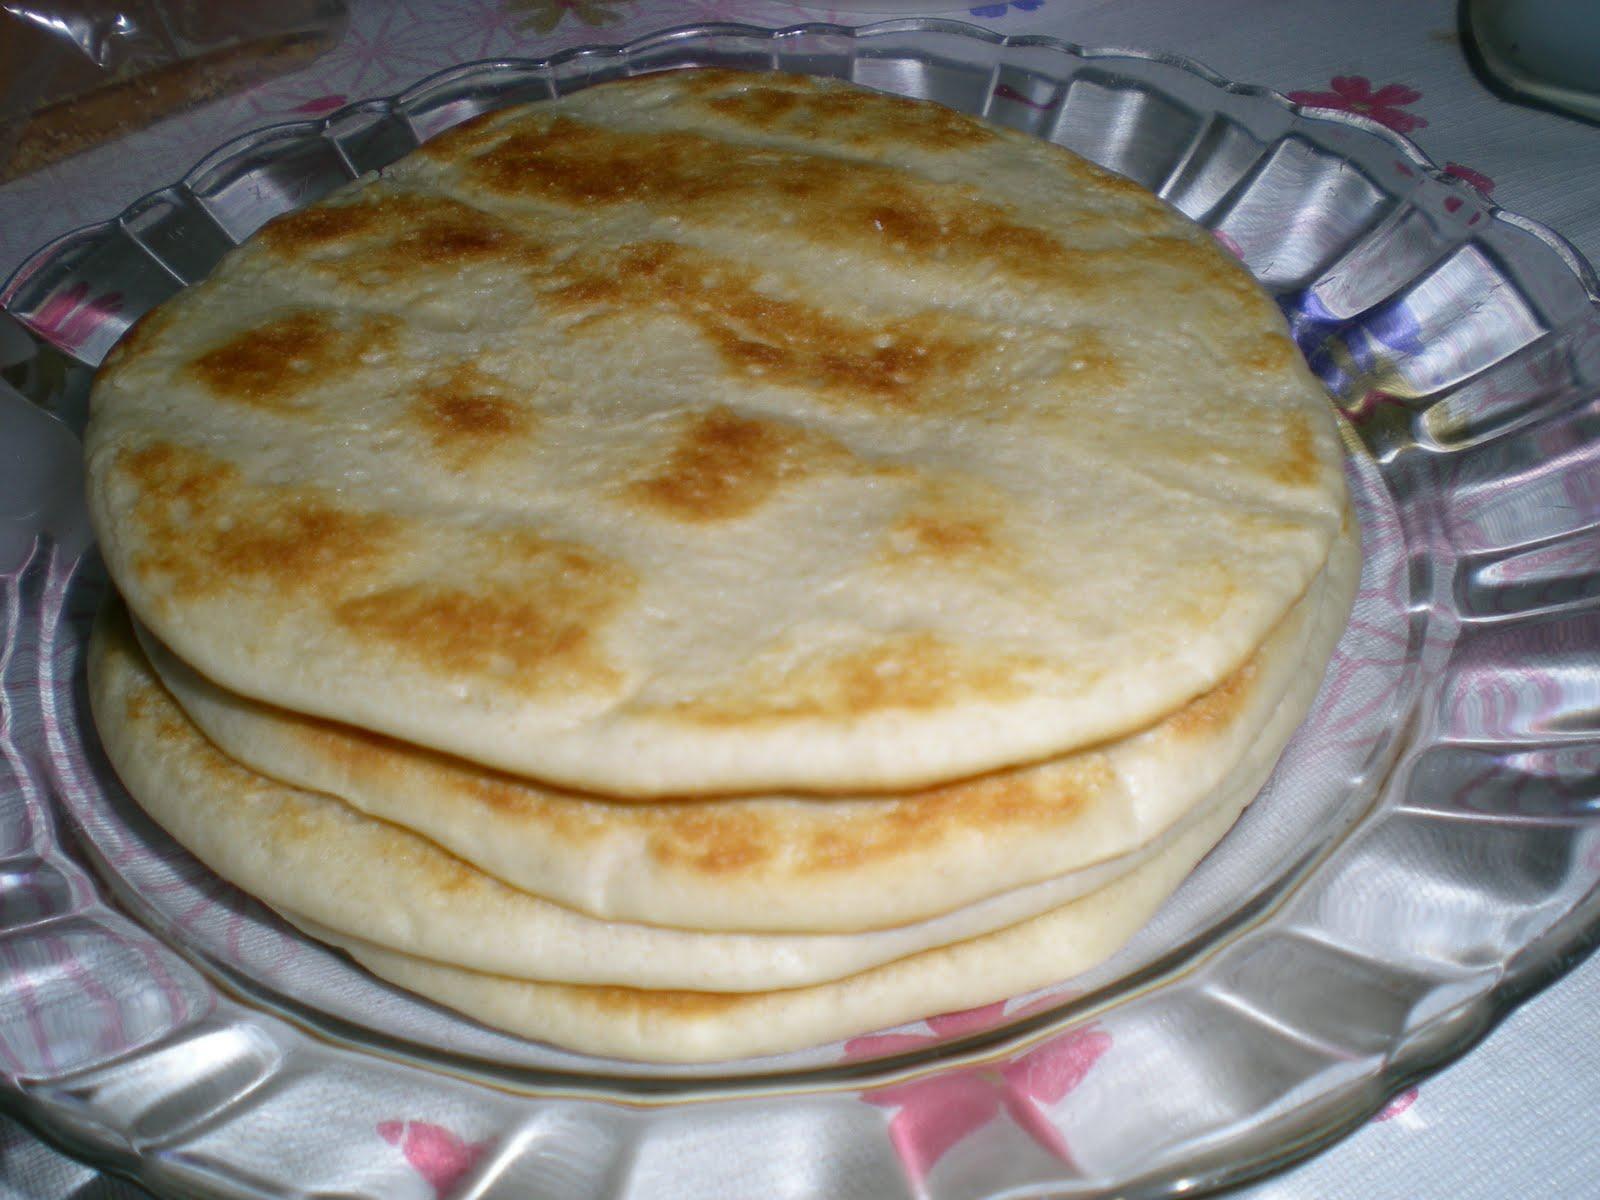 Resepi Roti Arab Guna Sukatan Cawan Inibaruresepi Gobitage Com